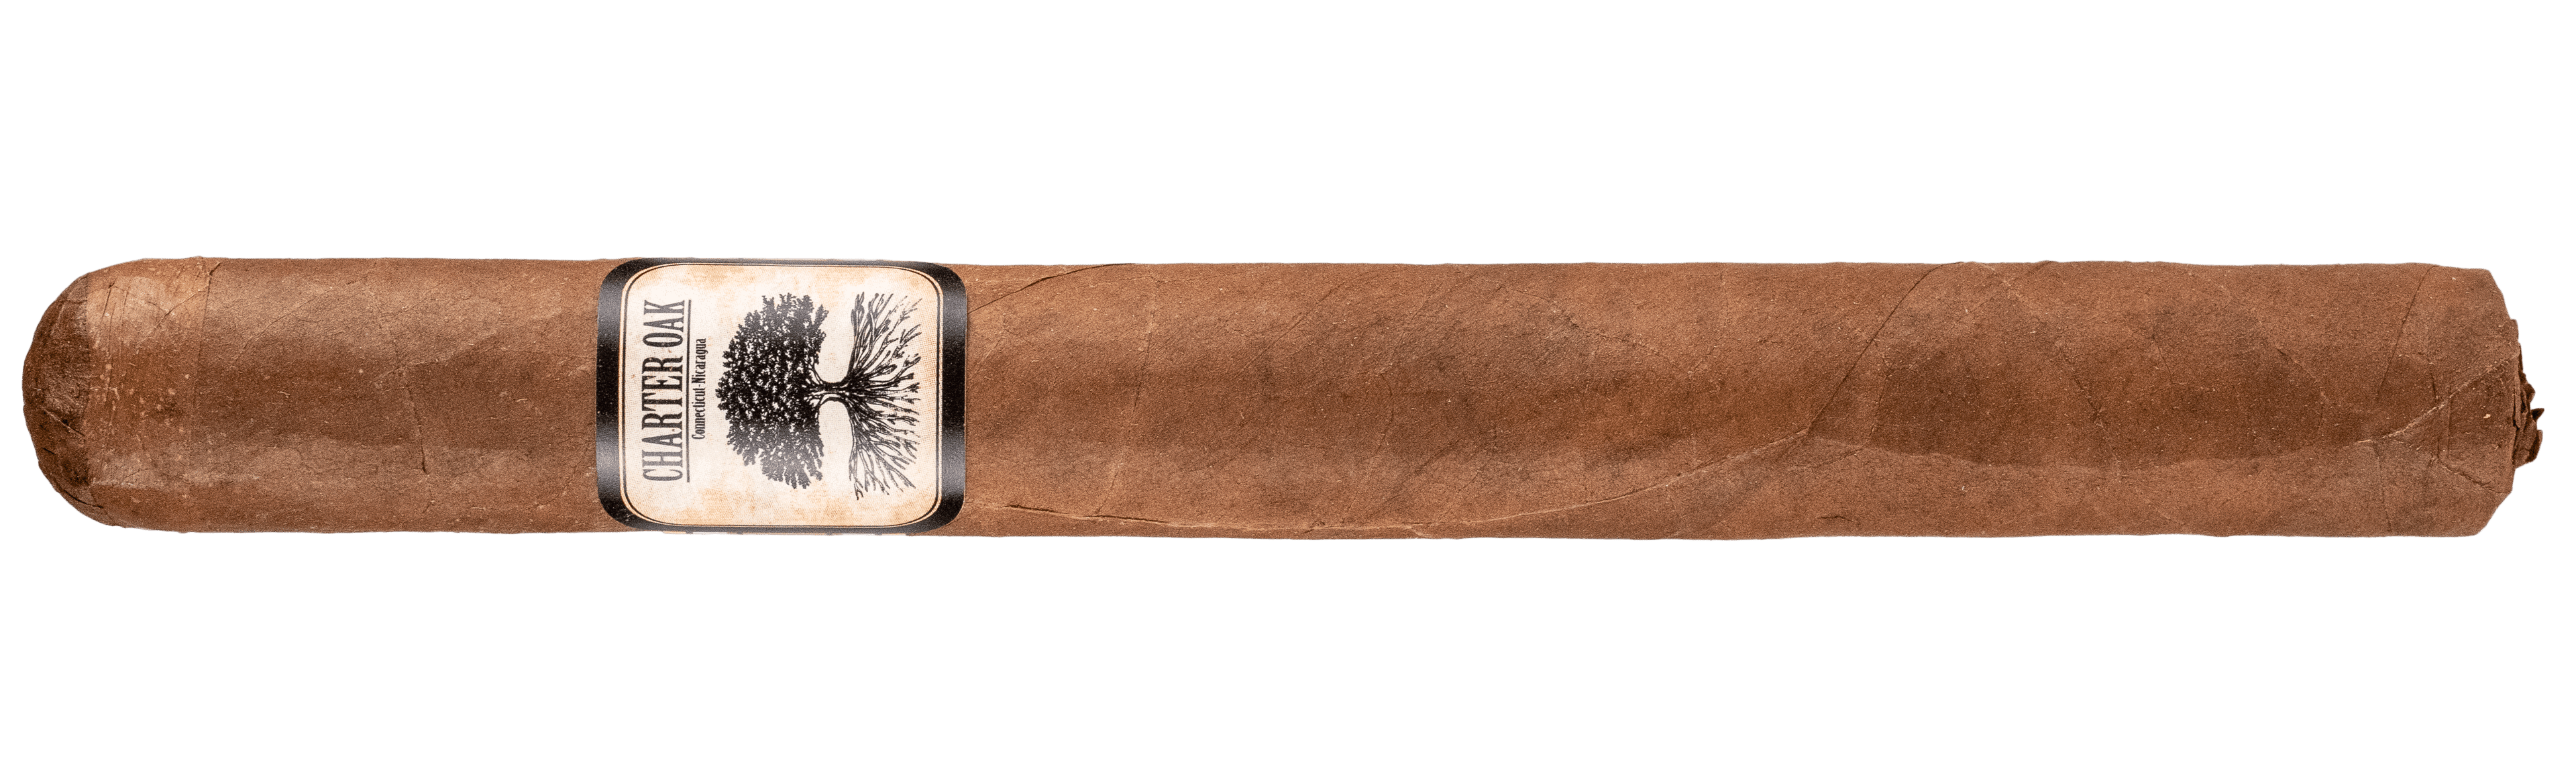 Blind Cigar Review: Foundation   Charter Oak Habano Lonsdale